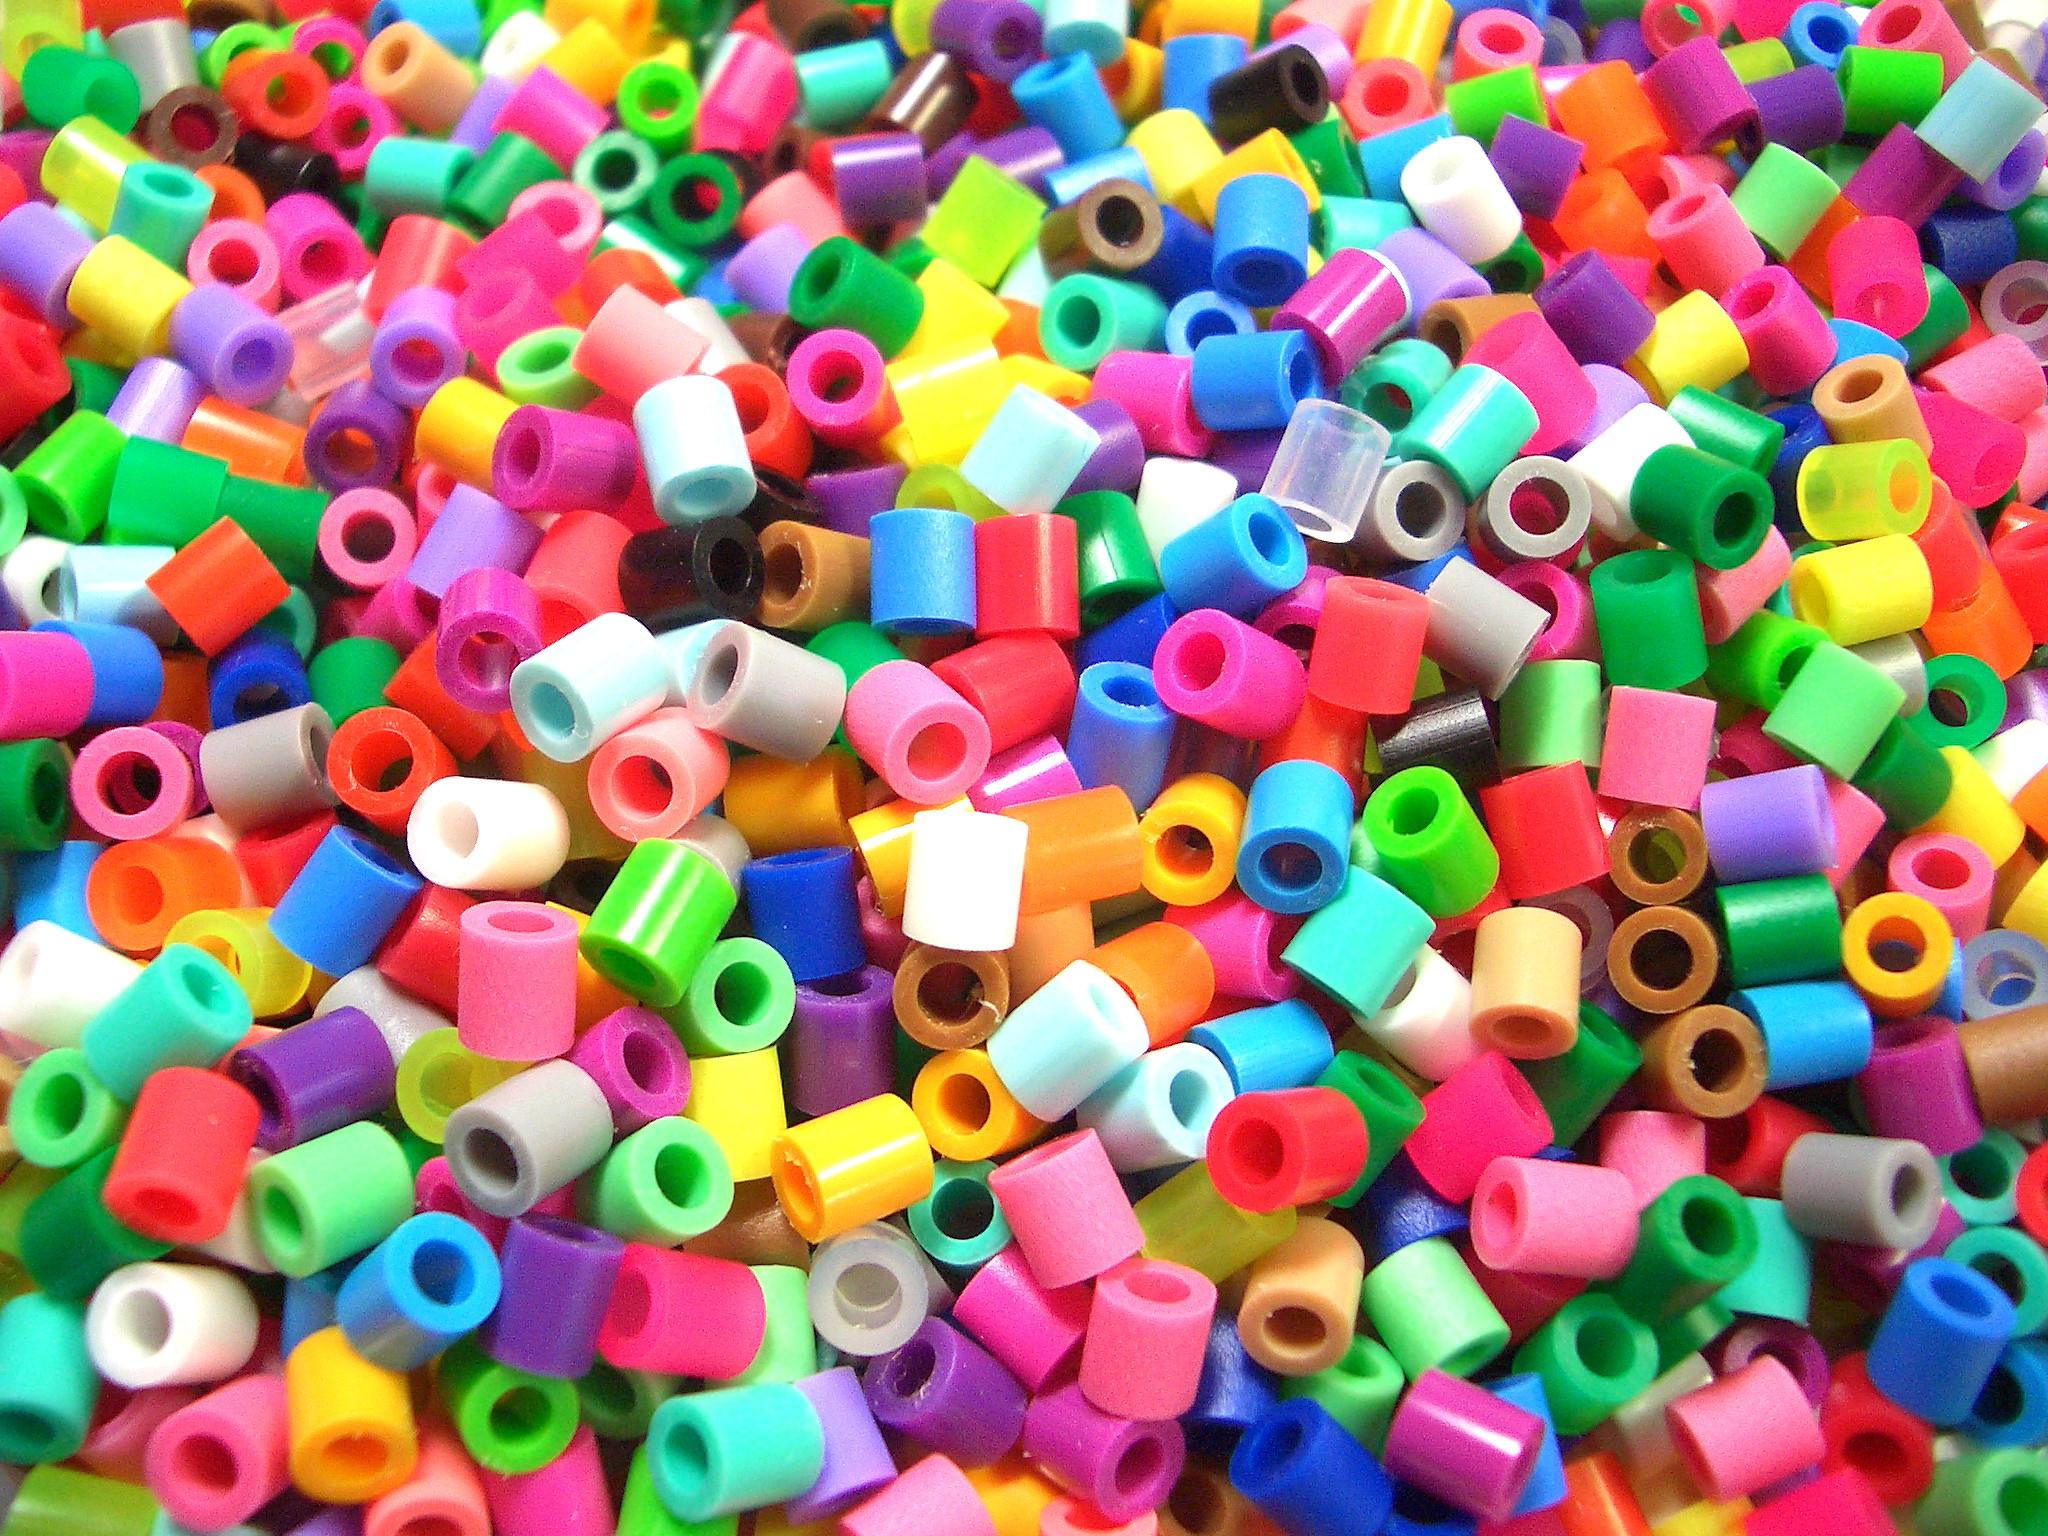 Plastic2.jpg